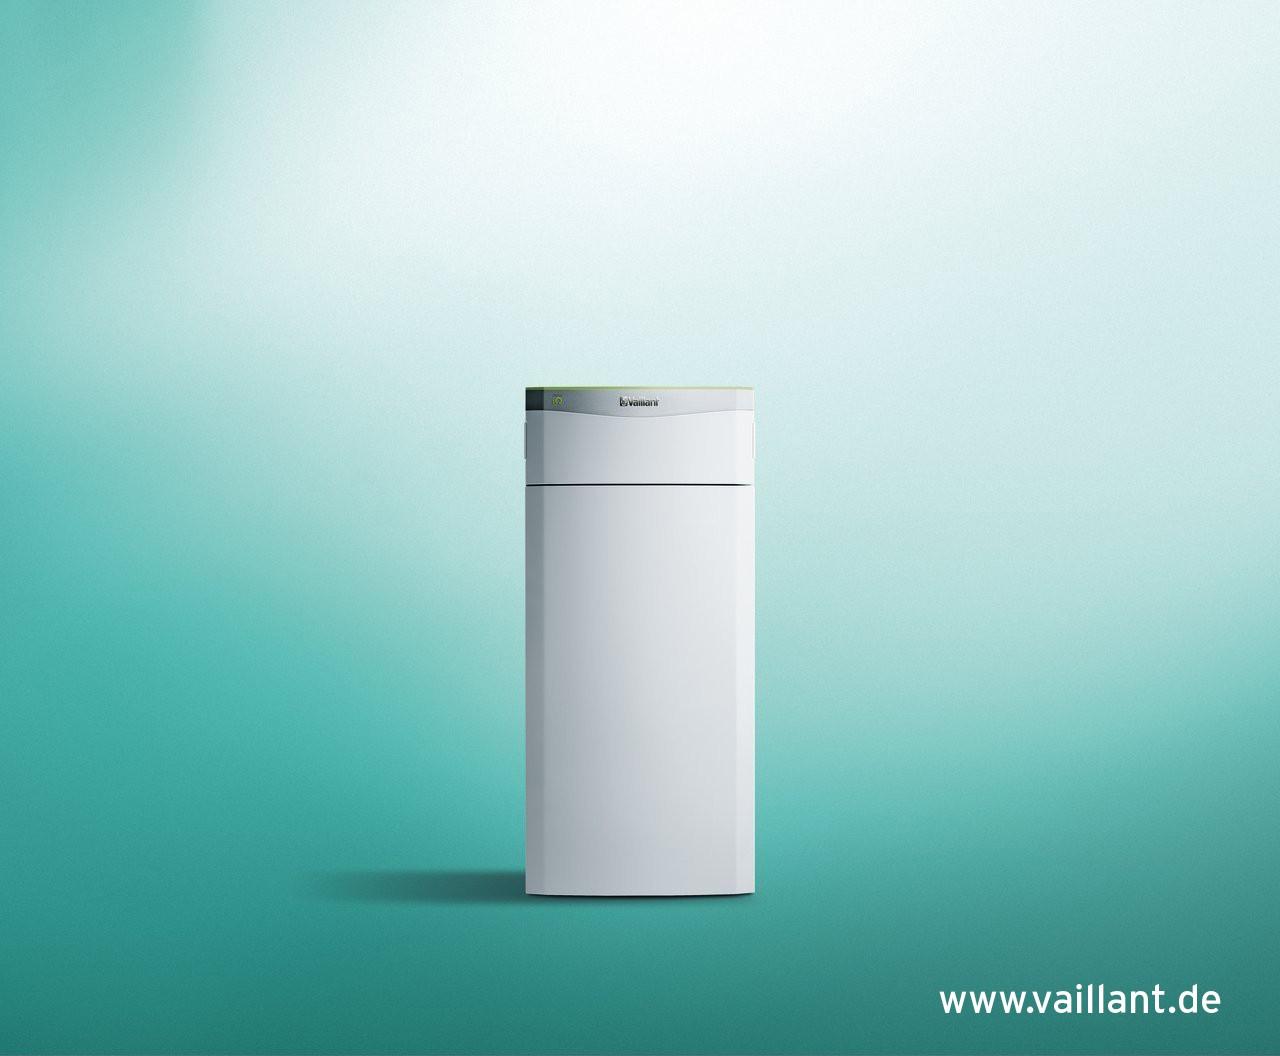 Vaillant VAILLANT Set 4.61 flexoTHERM exclusive VWF 57 /4